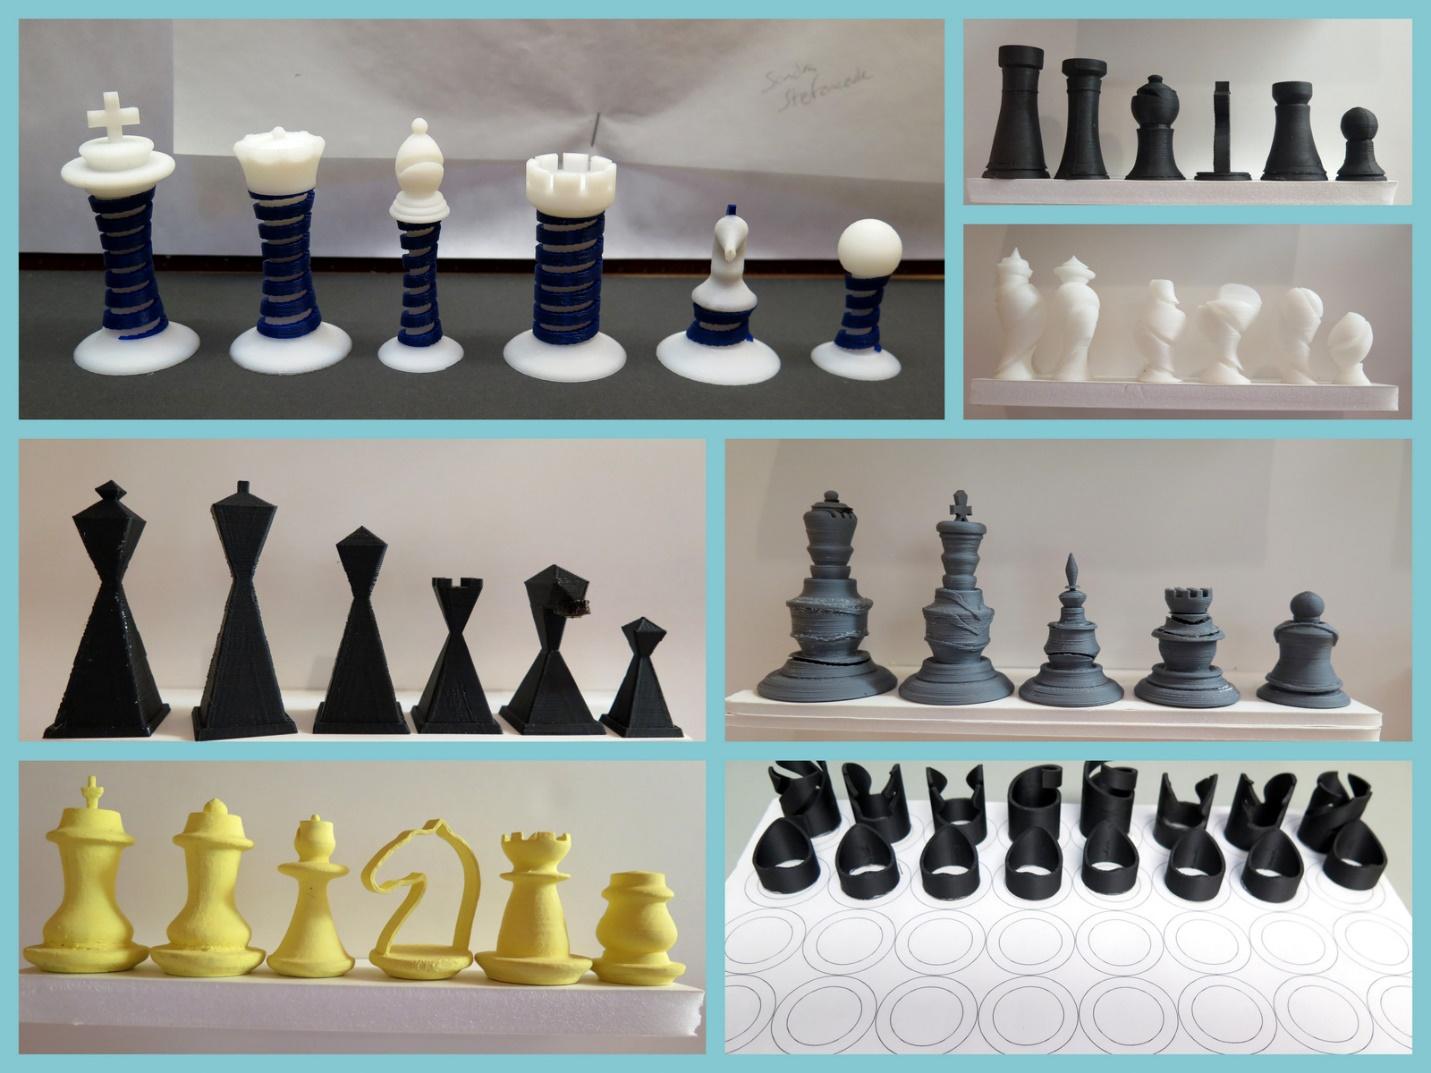 3D Printing Education